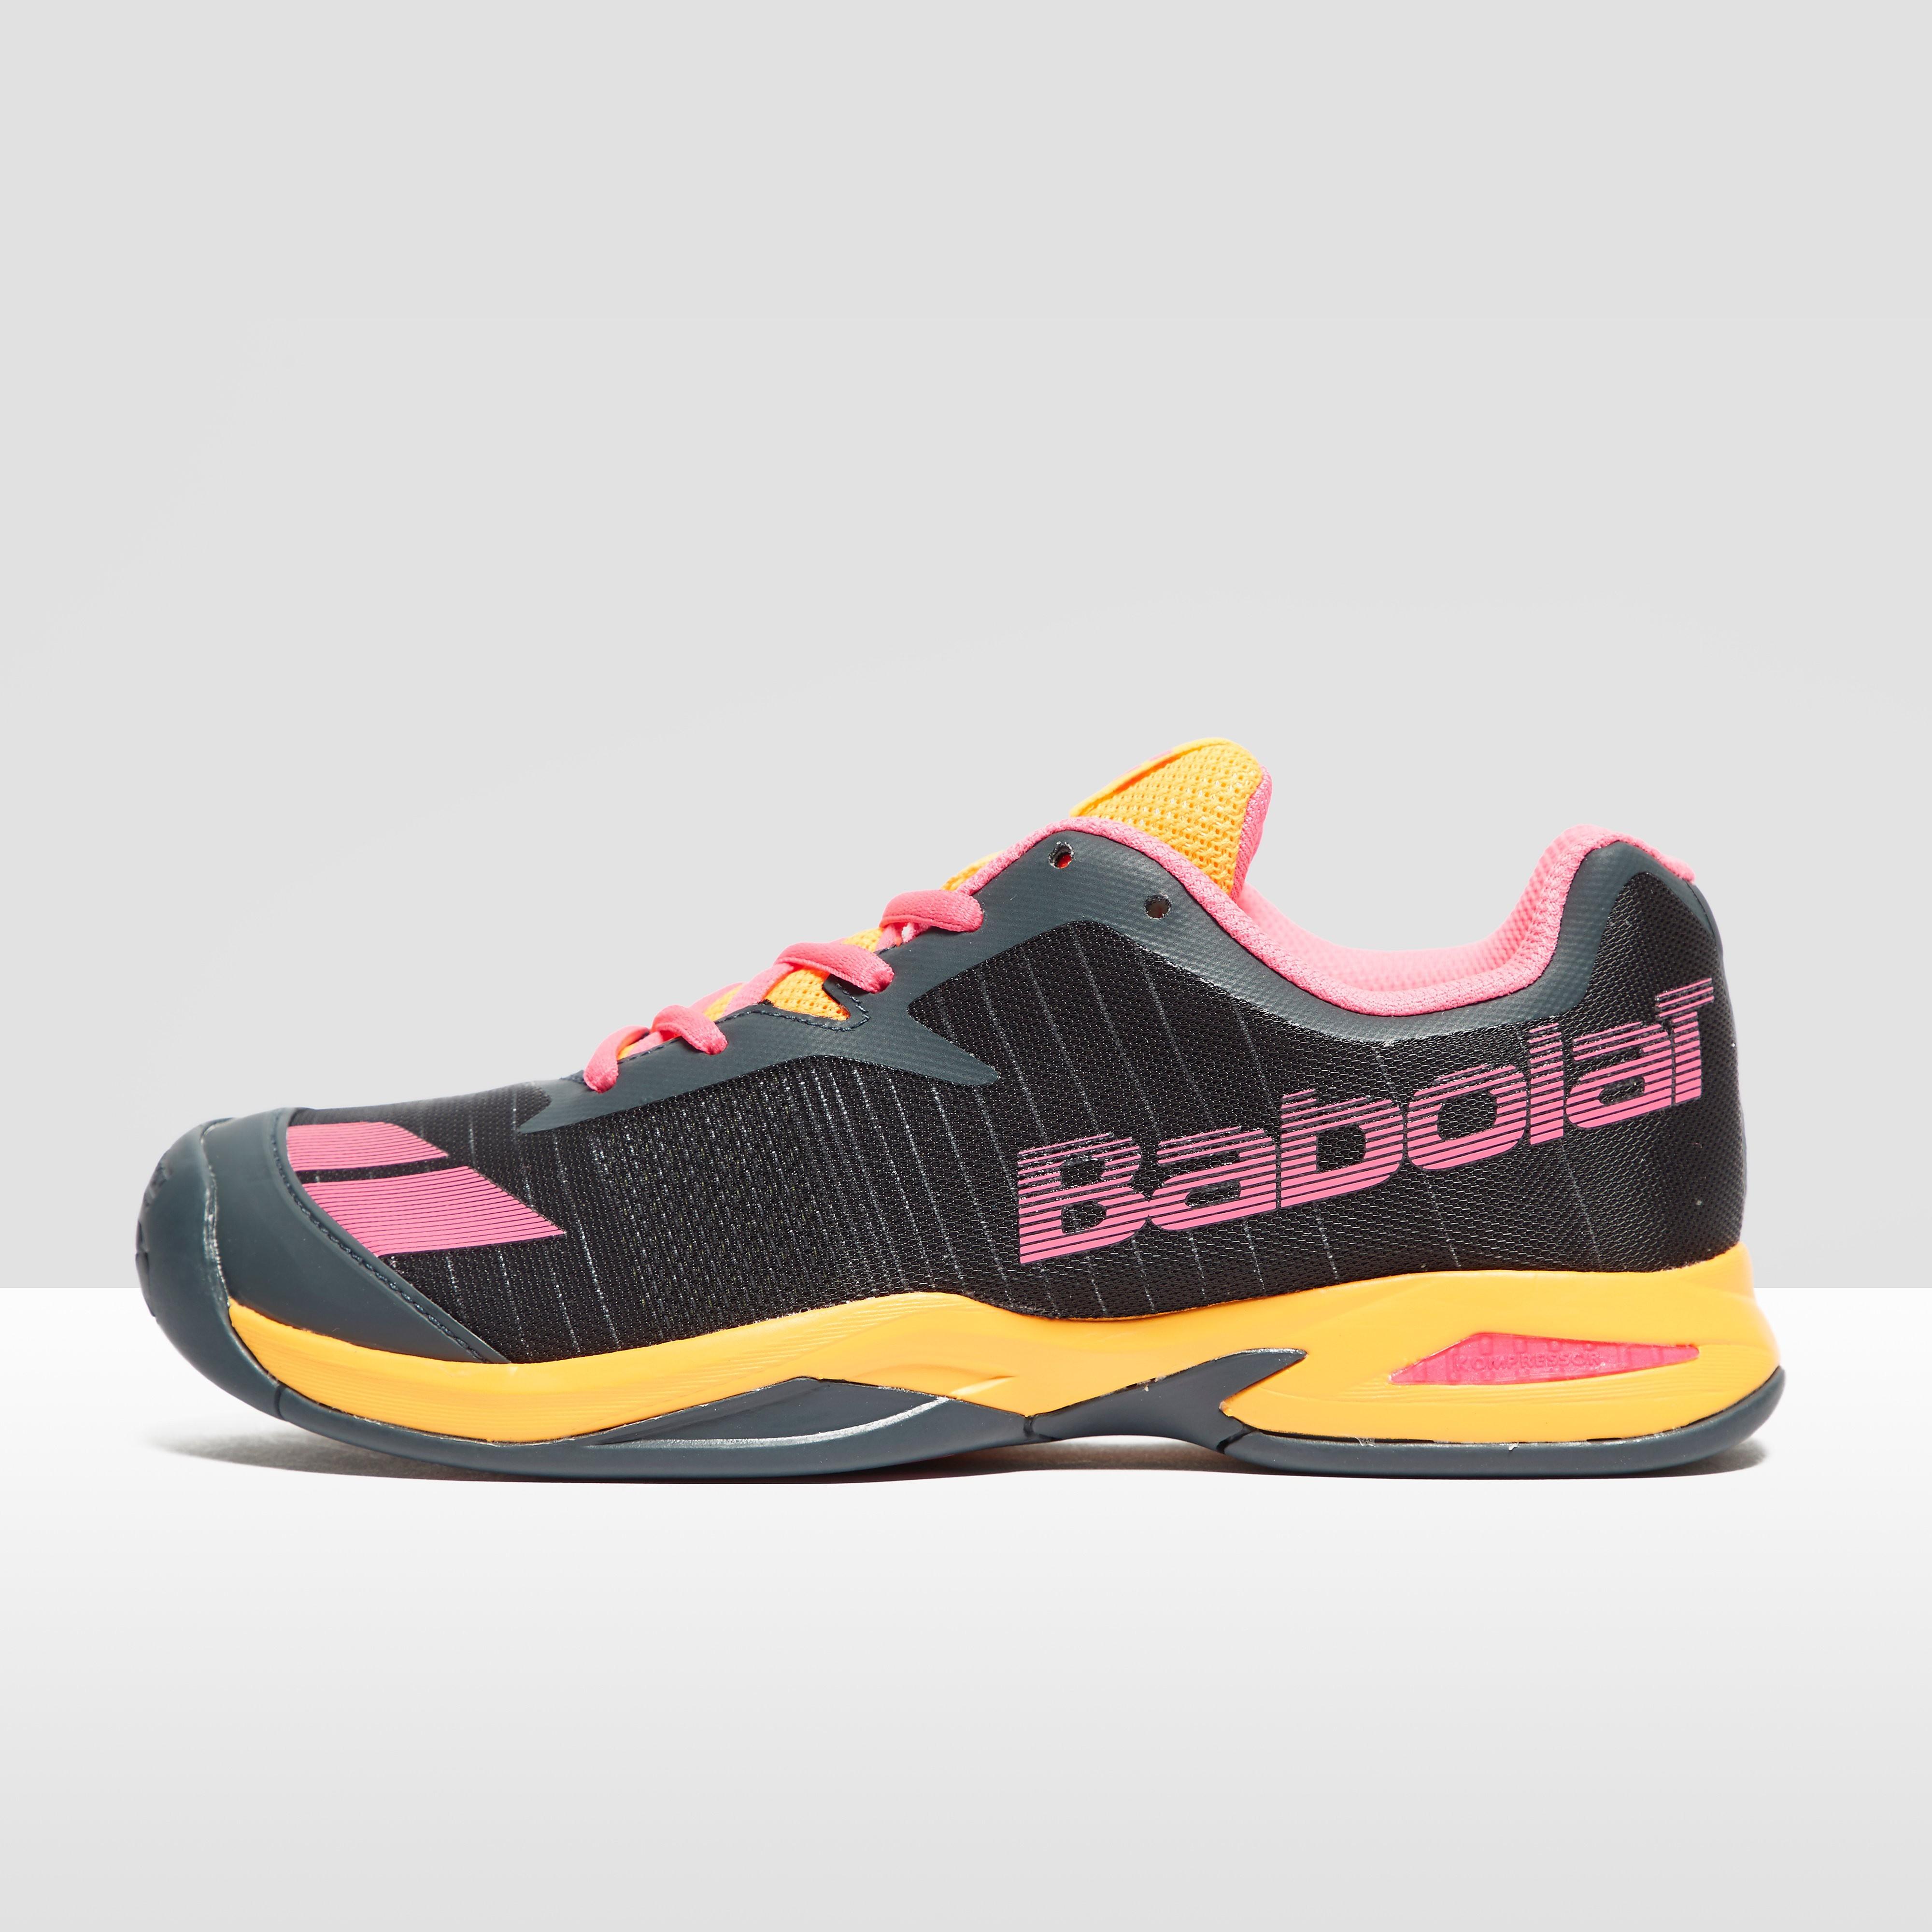 Babolat Jet All-Court Junior Tennis Shoes